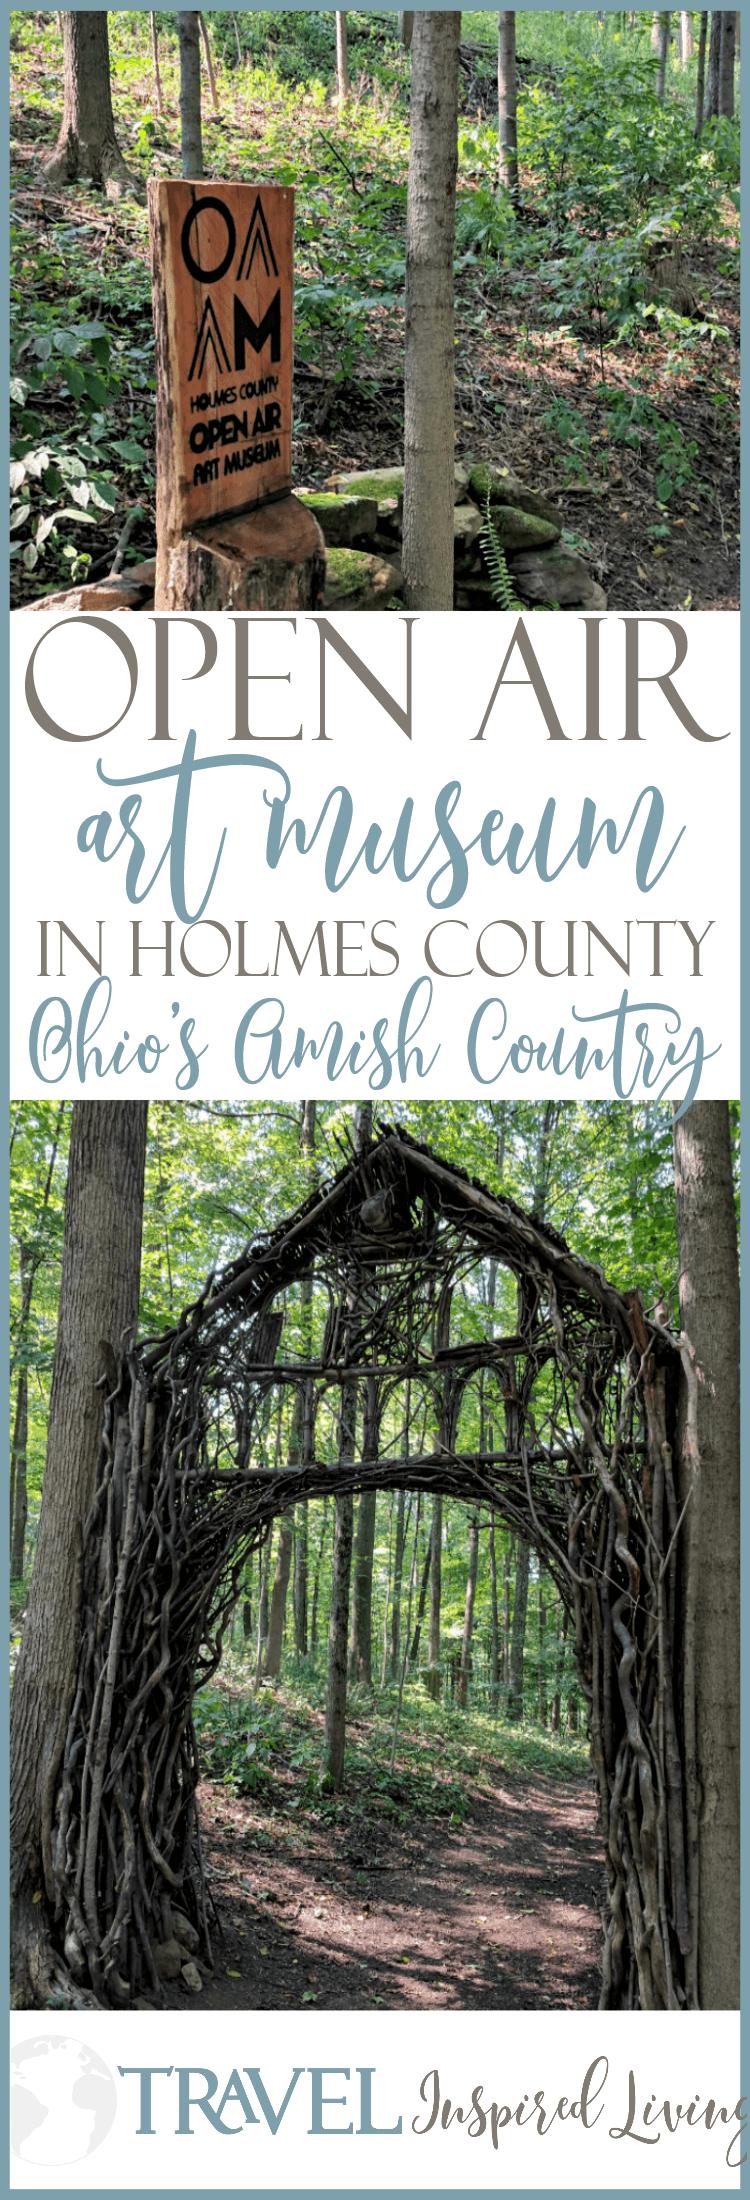 Take a Stroll through the Holmes County Open Air Art